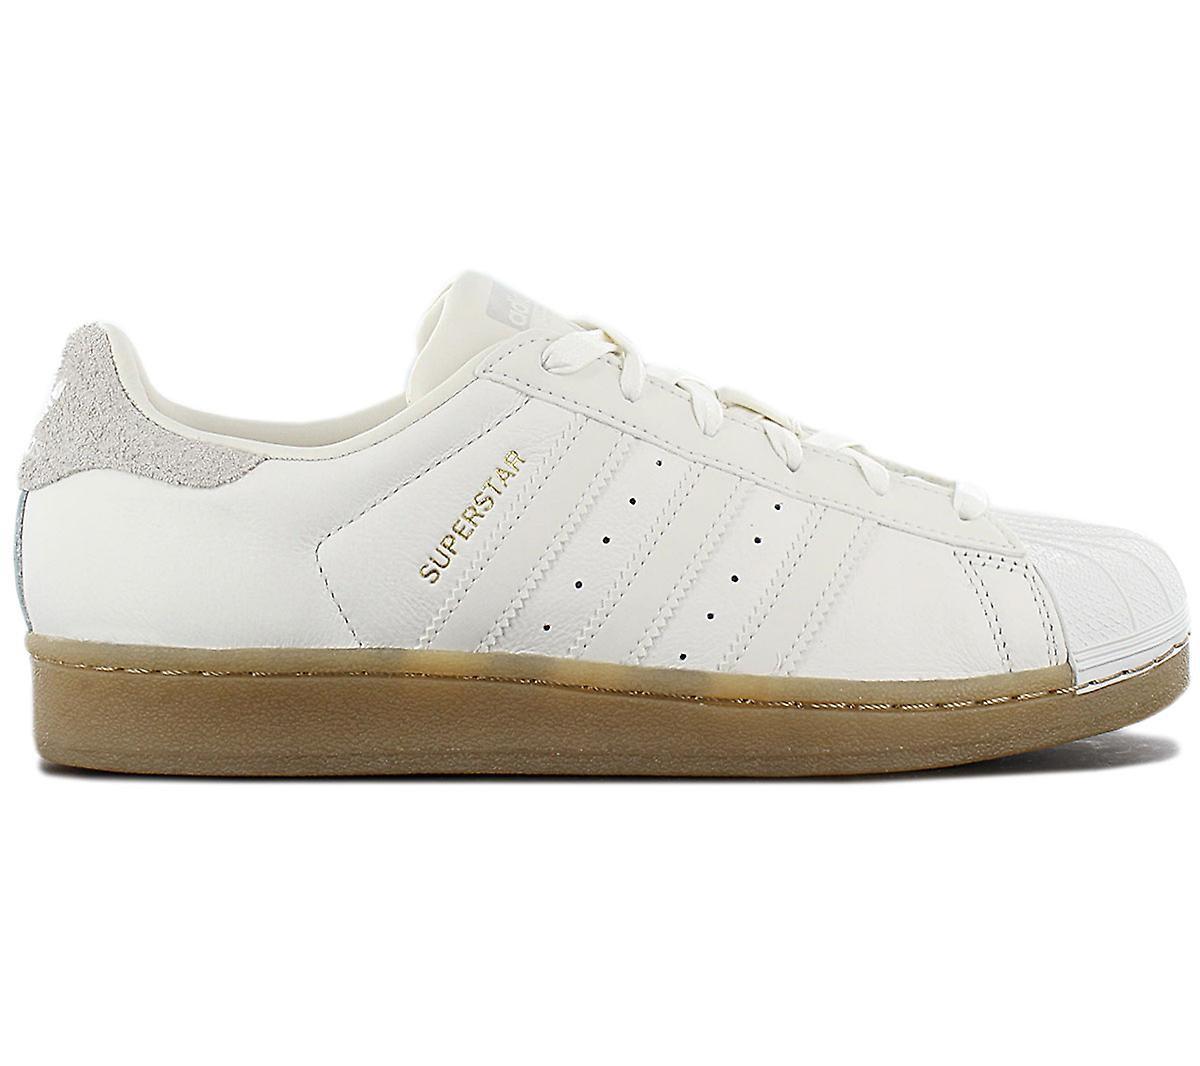 adidas Originals Superstar W - Chaussures pour femmes White B37147 Sneakers Chaussures de sport